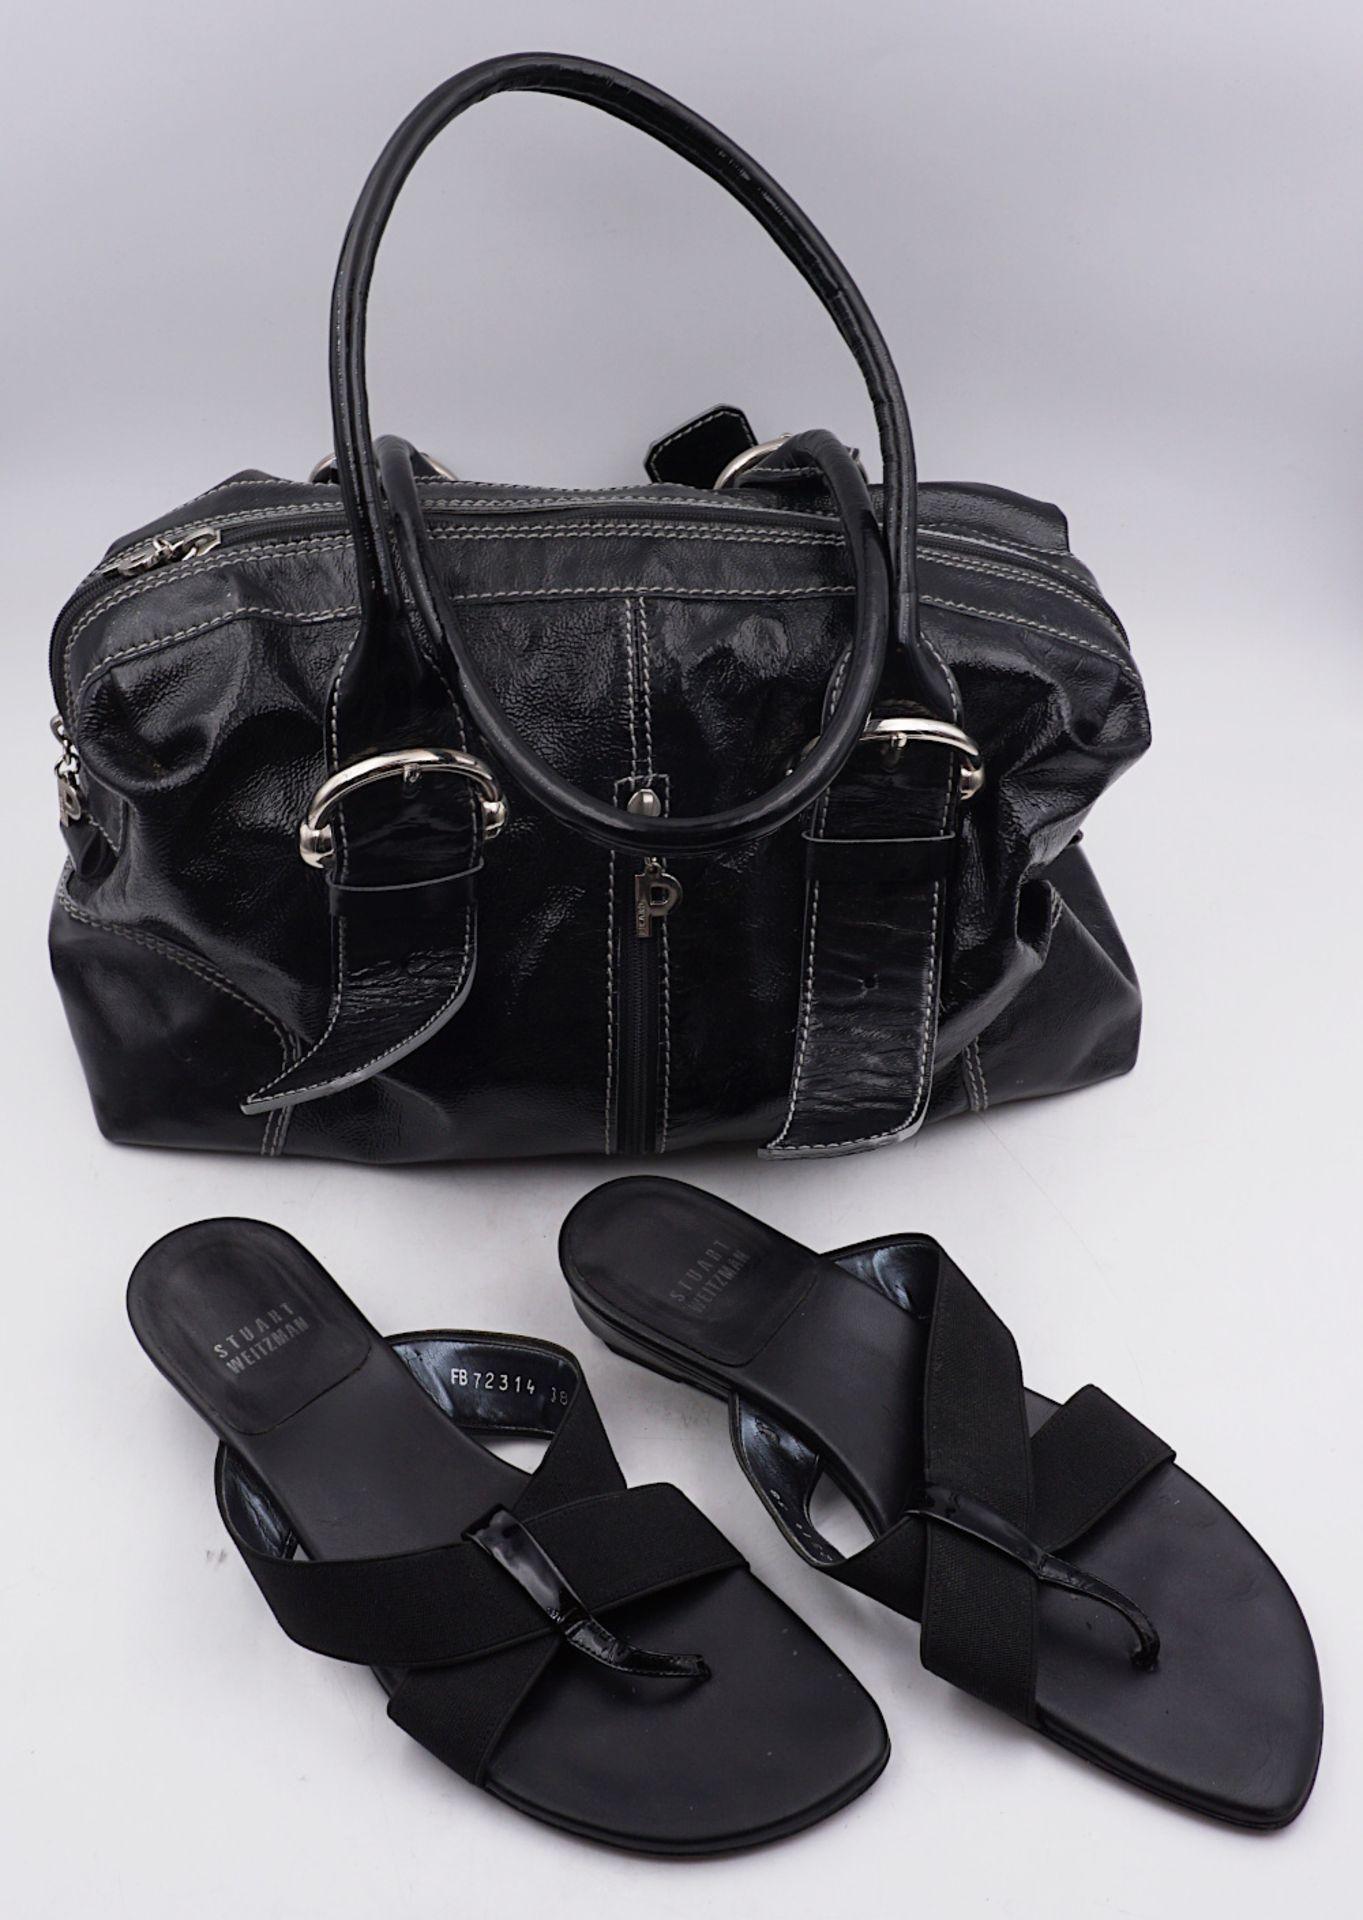 1 Damenhandtasche PICARD Lack schwarz sowie 1 Paar Zehensandalen STUART WEITZMAN jew. Tsp./Asp.<